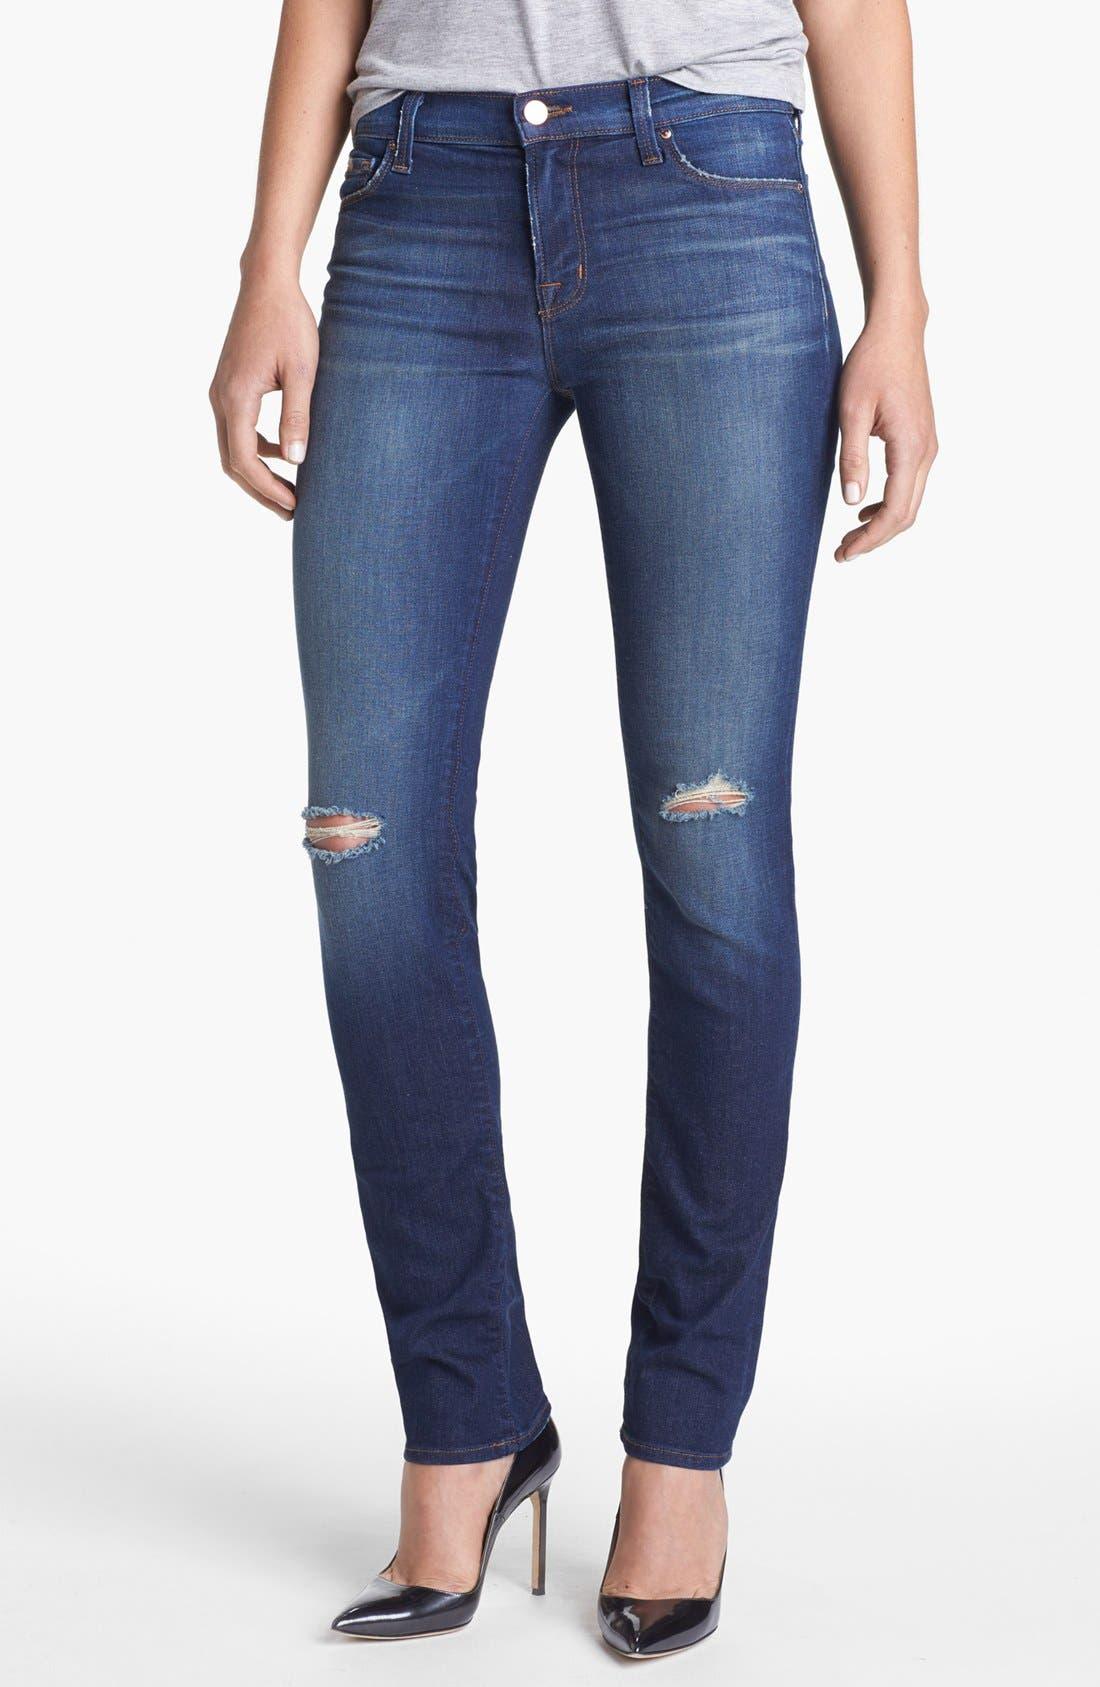 Alternate Image 1 Selected - J Brand 'Rail' Distressed Skinny Jeans (Alta)